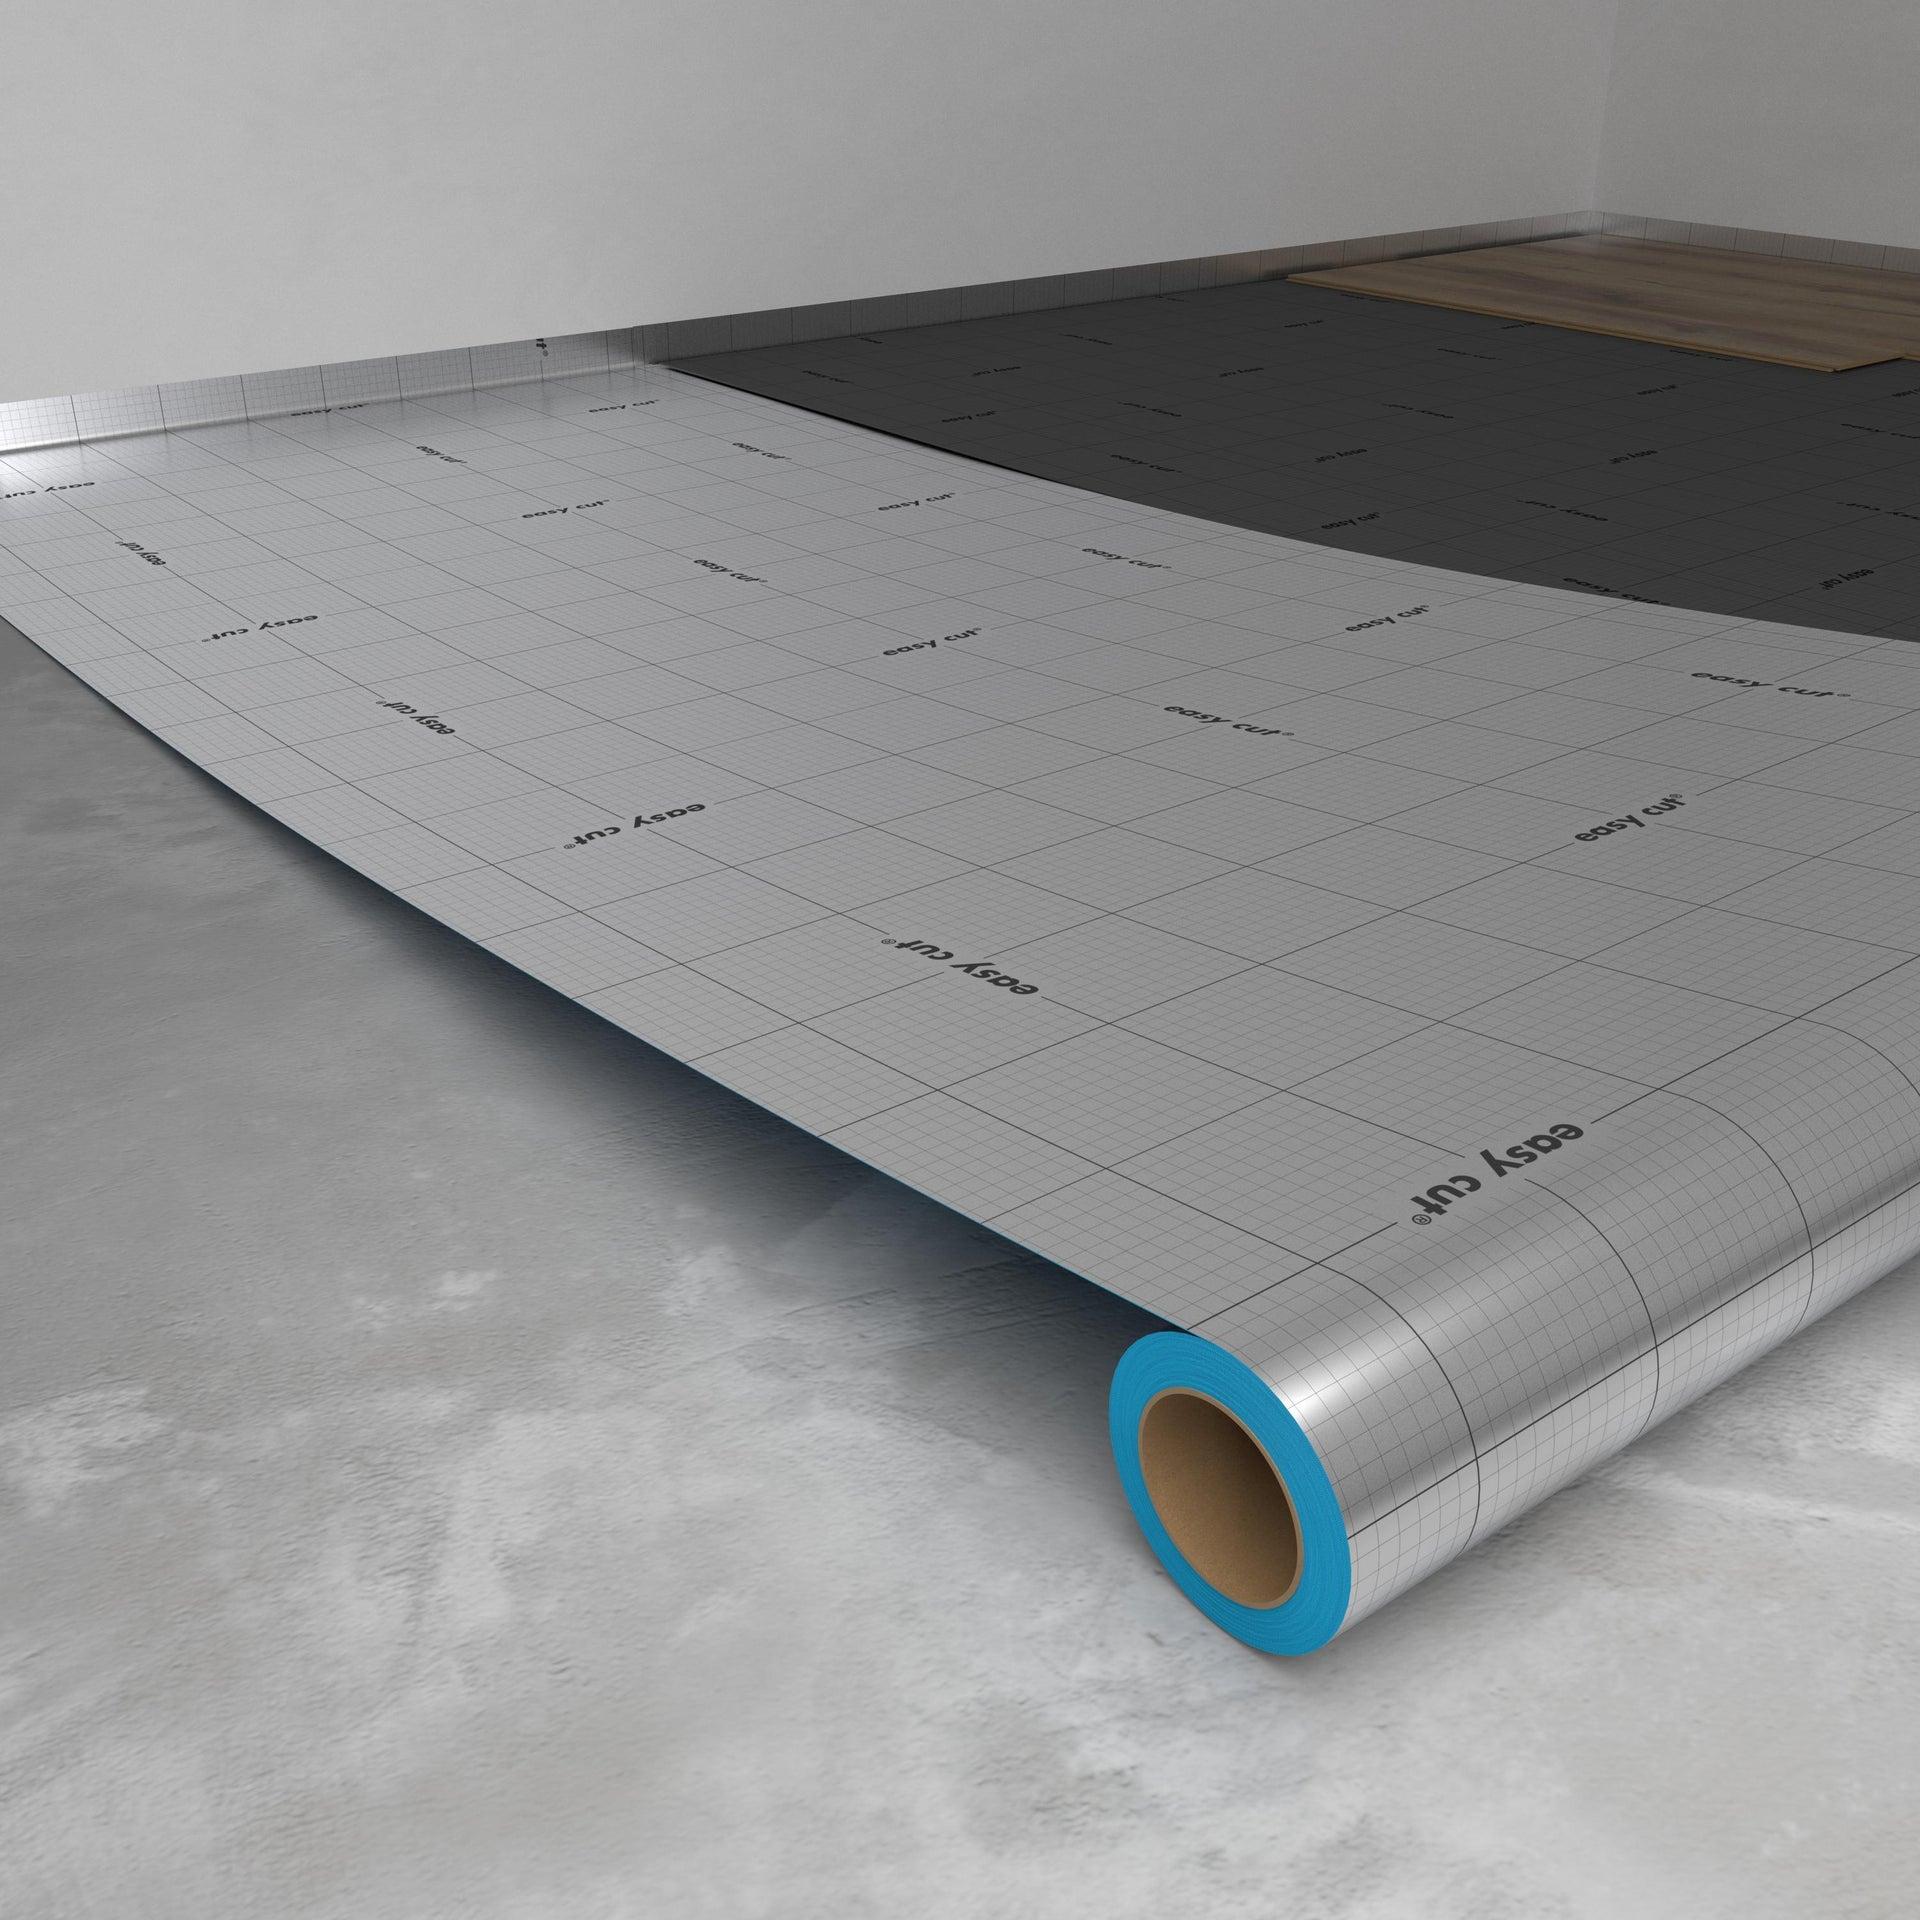 Sottopavimento AXTON Aqua Protect Sp 0.2 mm - 8